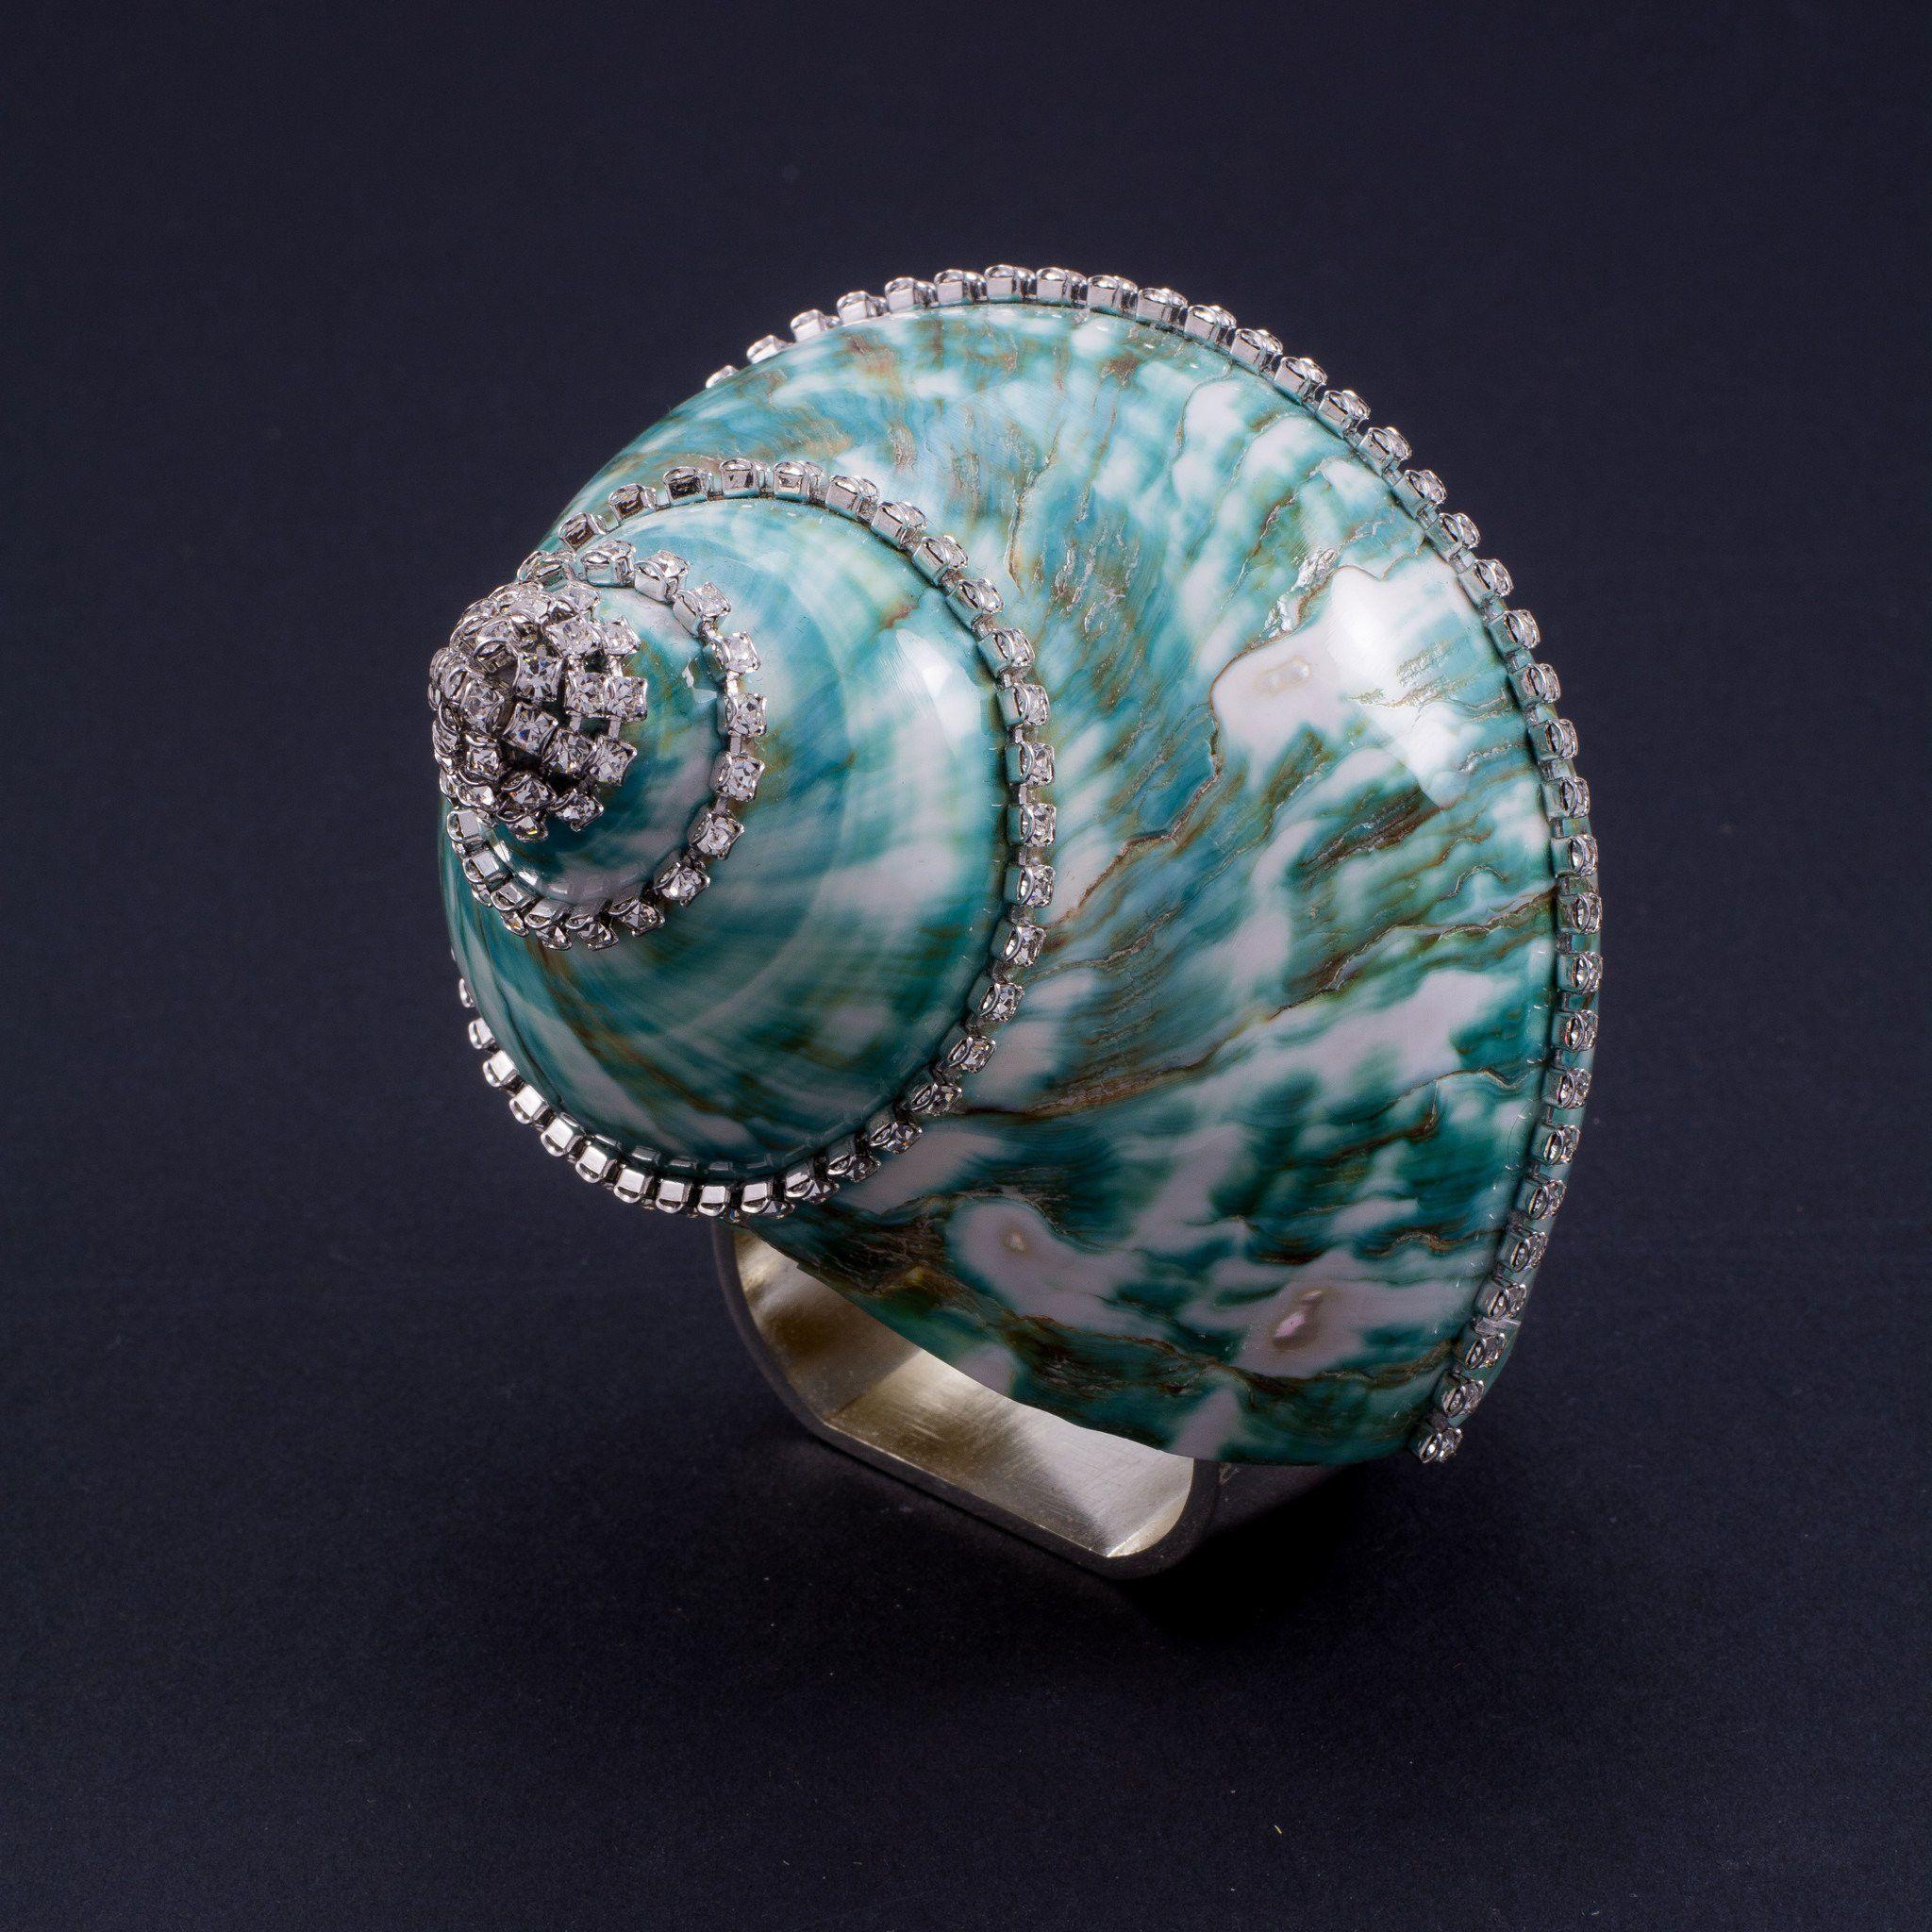 Napkin Rings Featuring Swarovski © Crystals and Jade Turbo Seashell   Set of 4